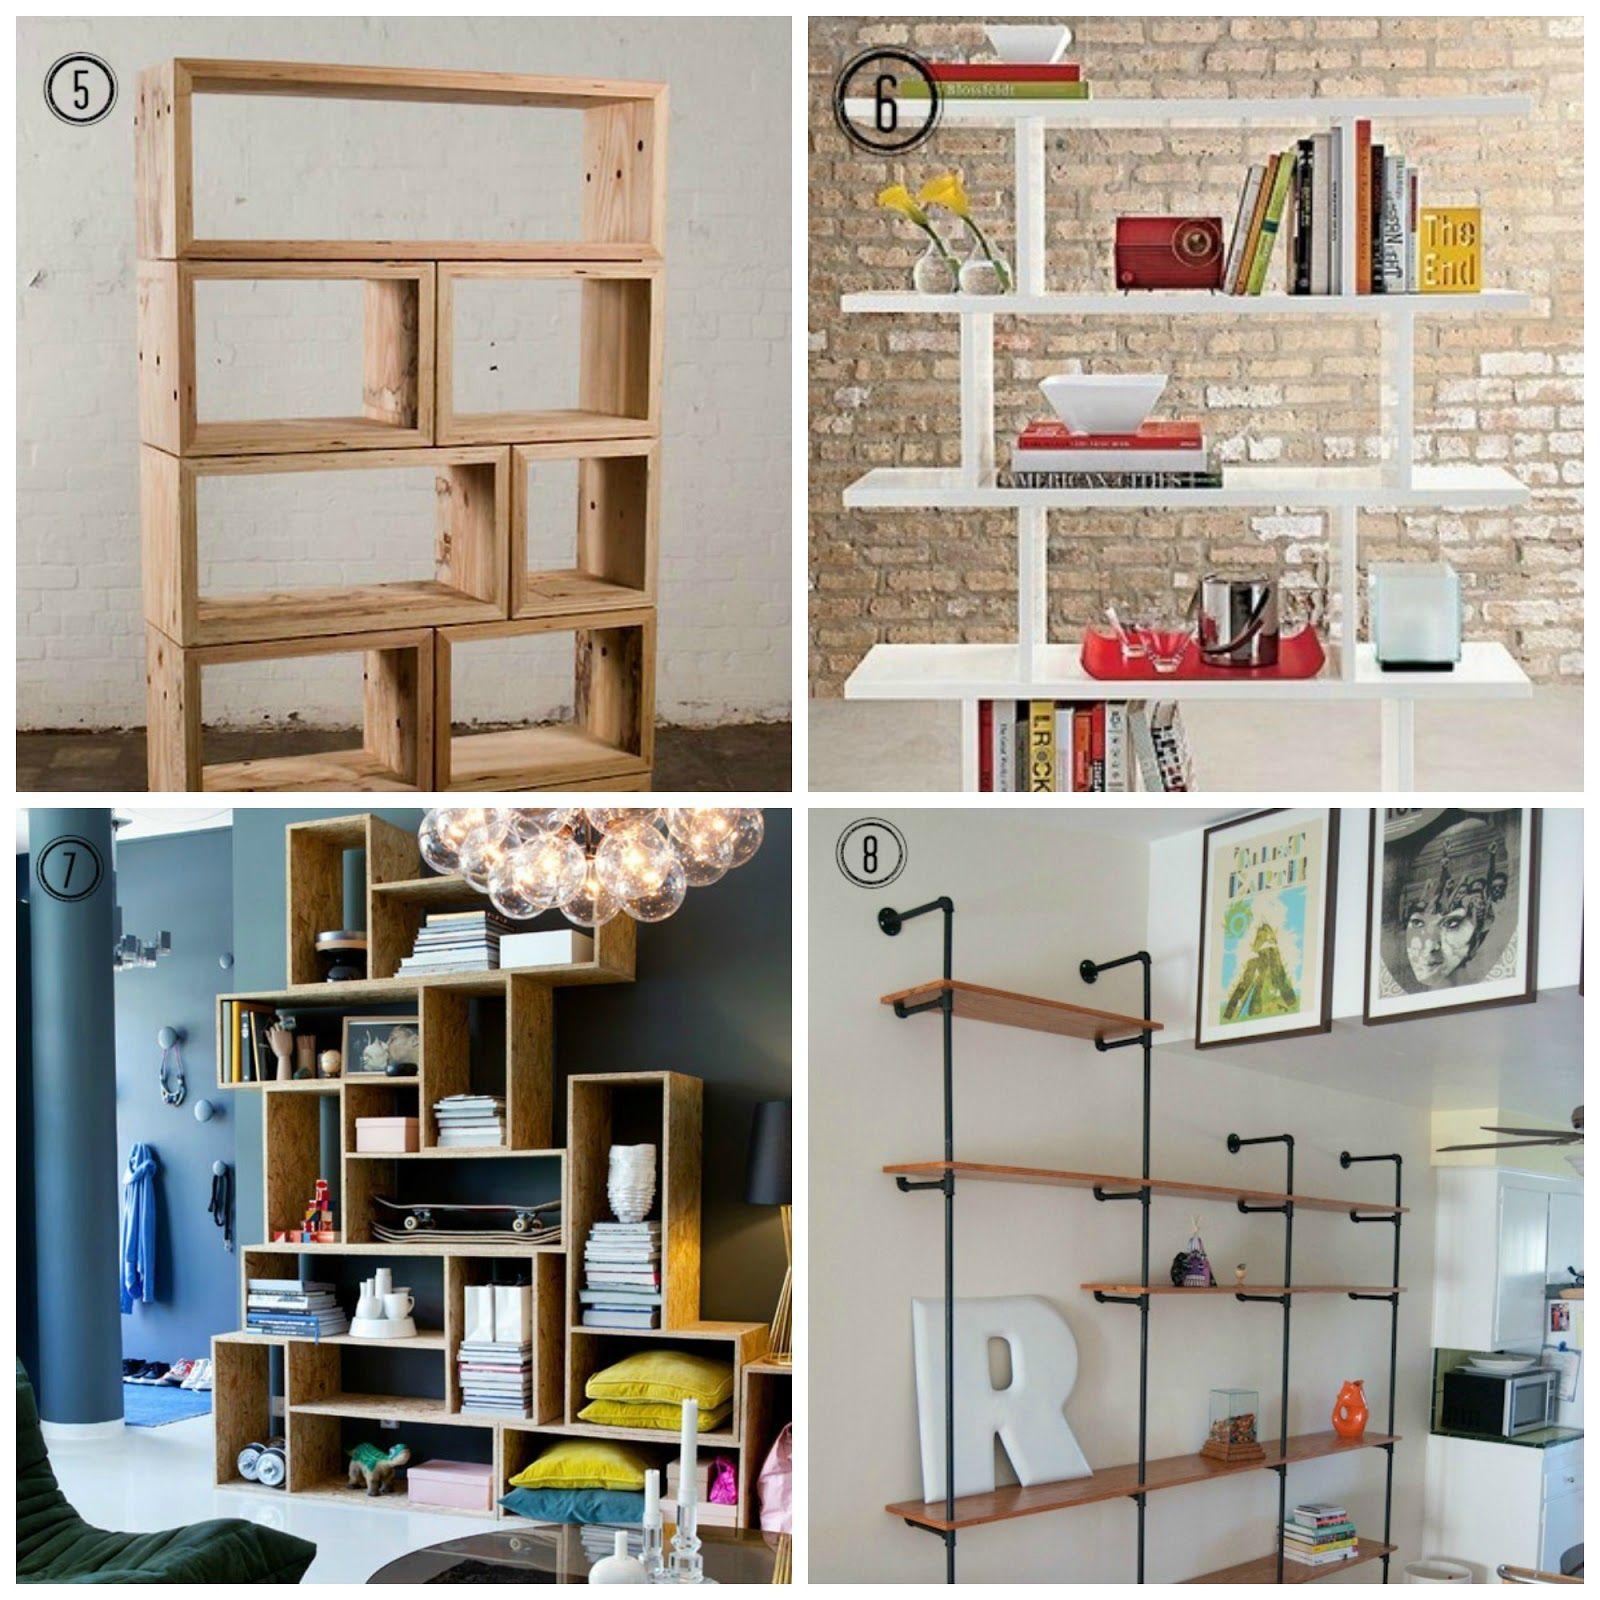 Design Tendencies 8 DIY Shelf Ideas